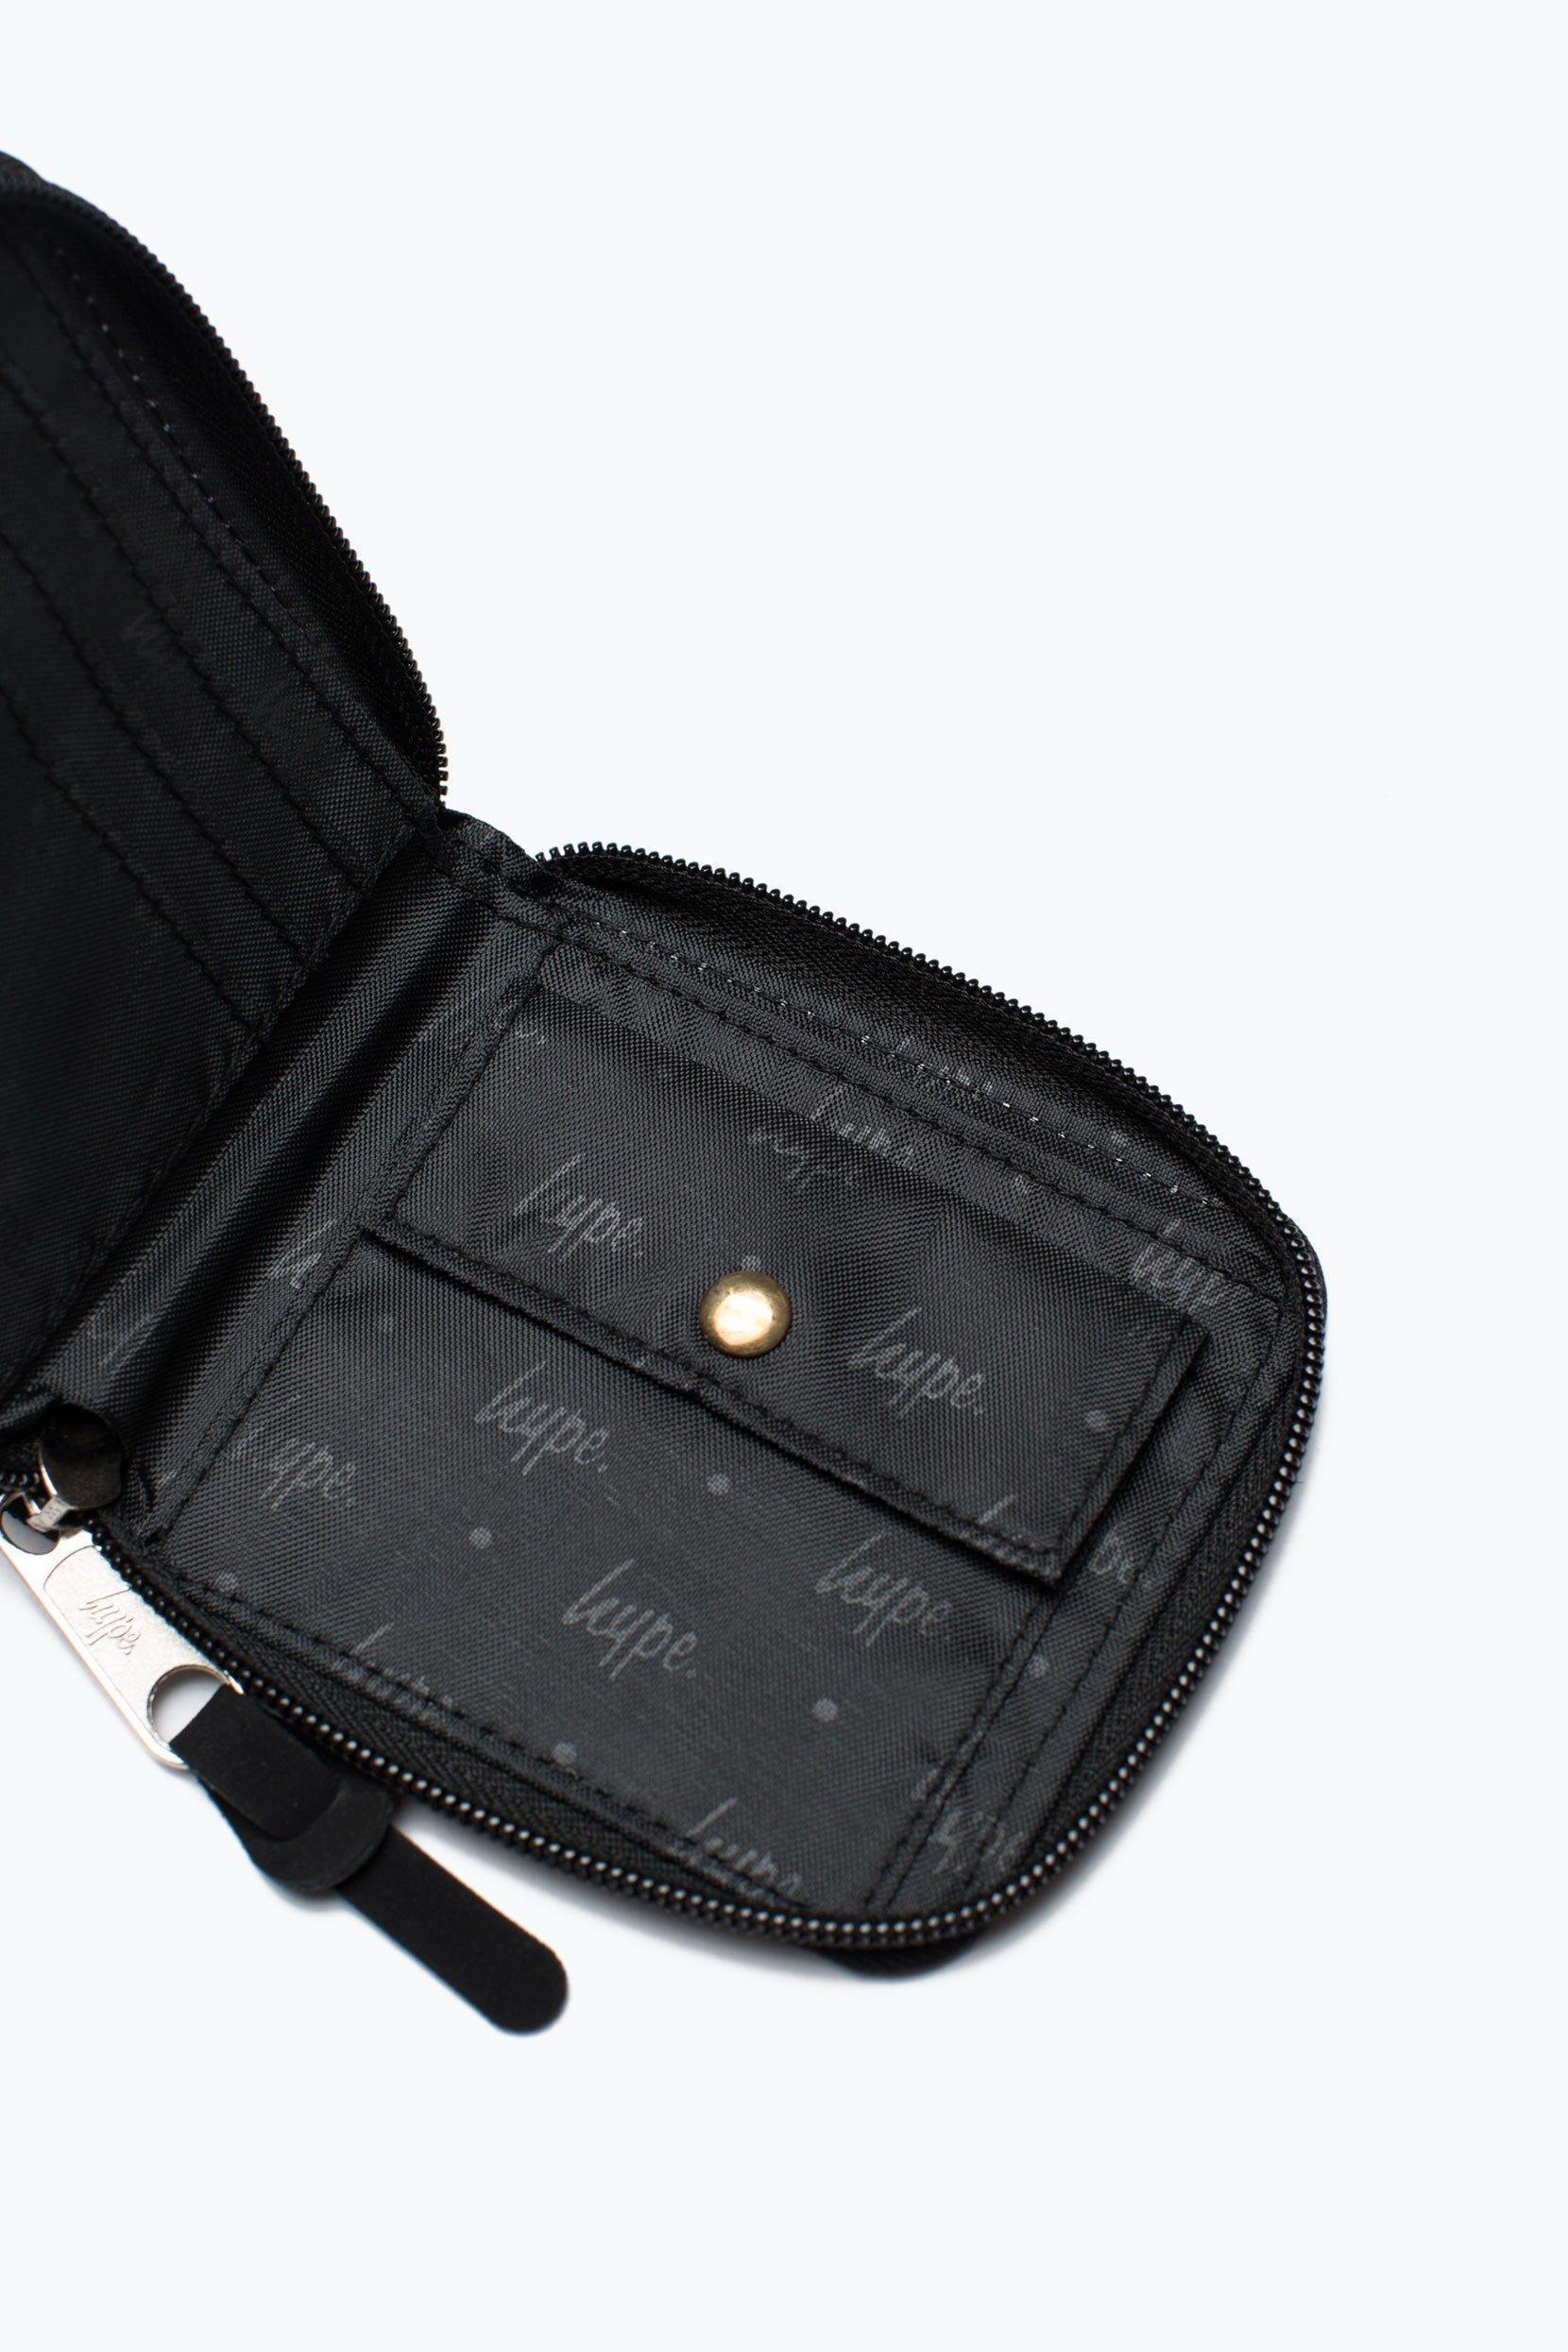 HYPE Bts17 Black/White Script Zip Wallet